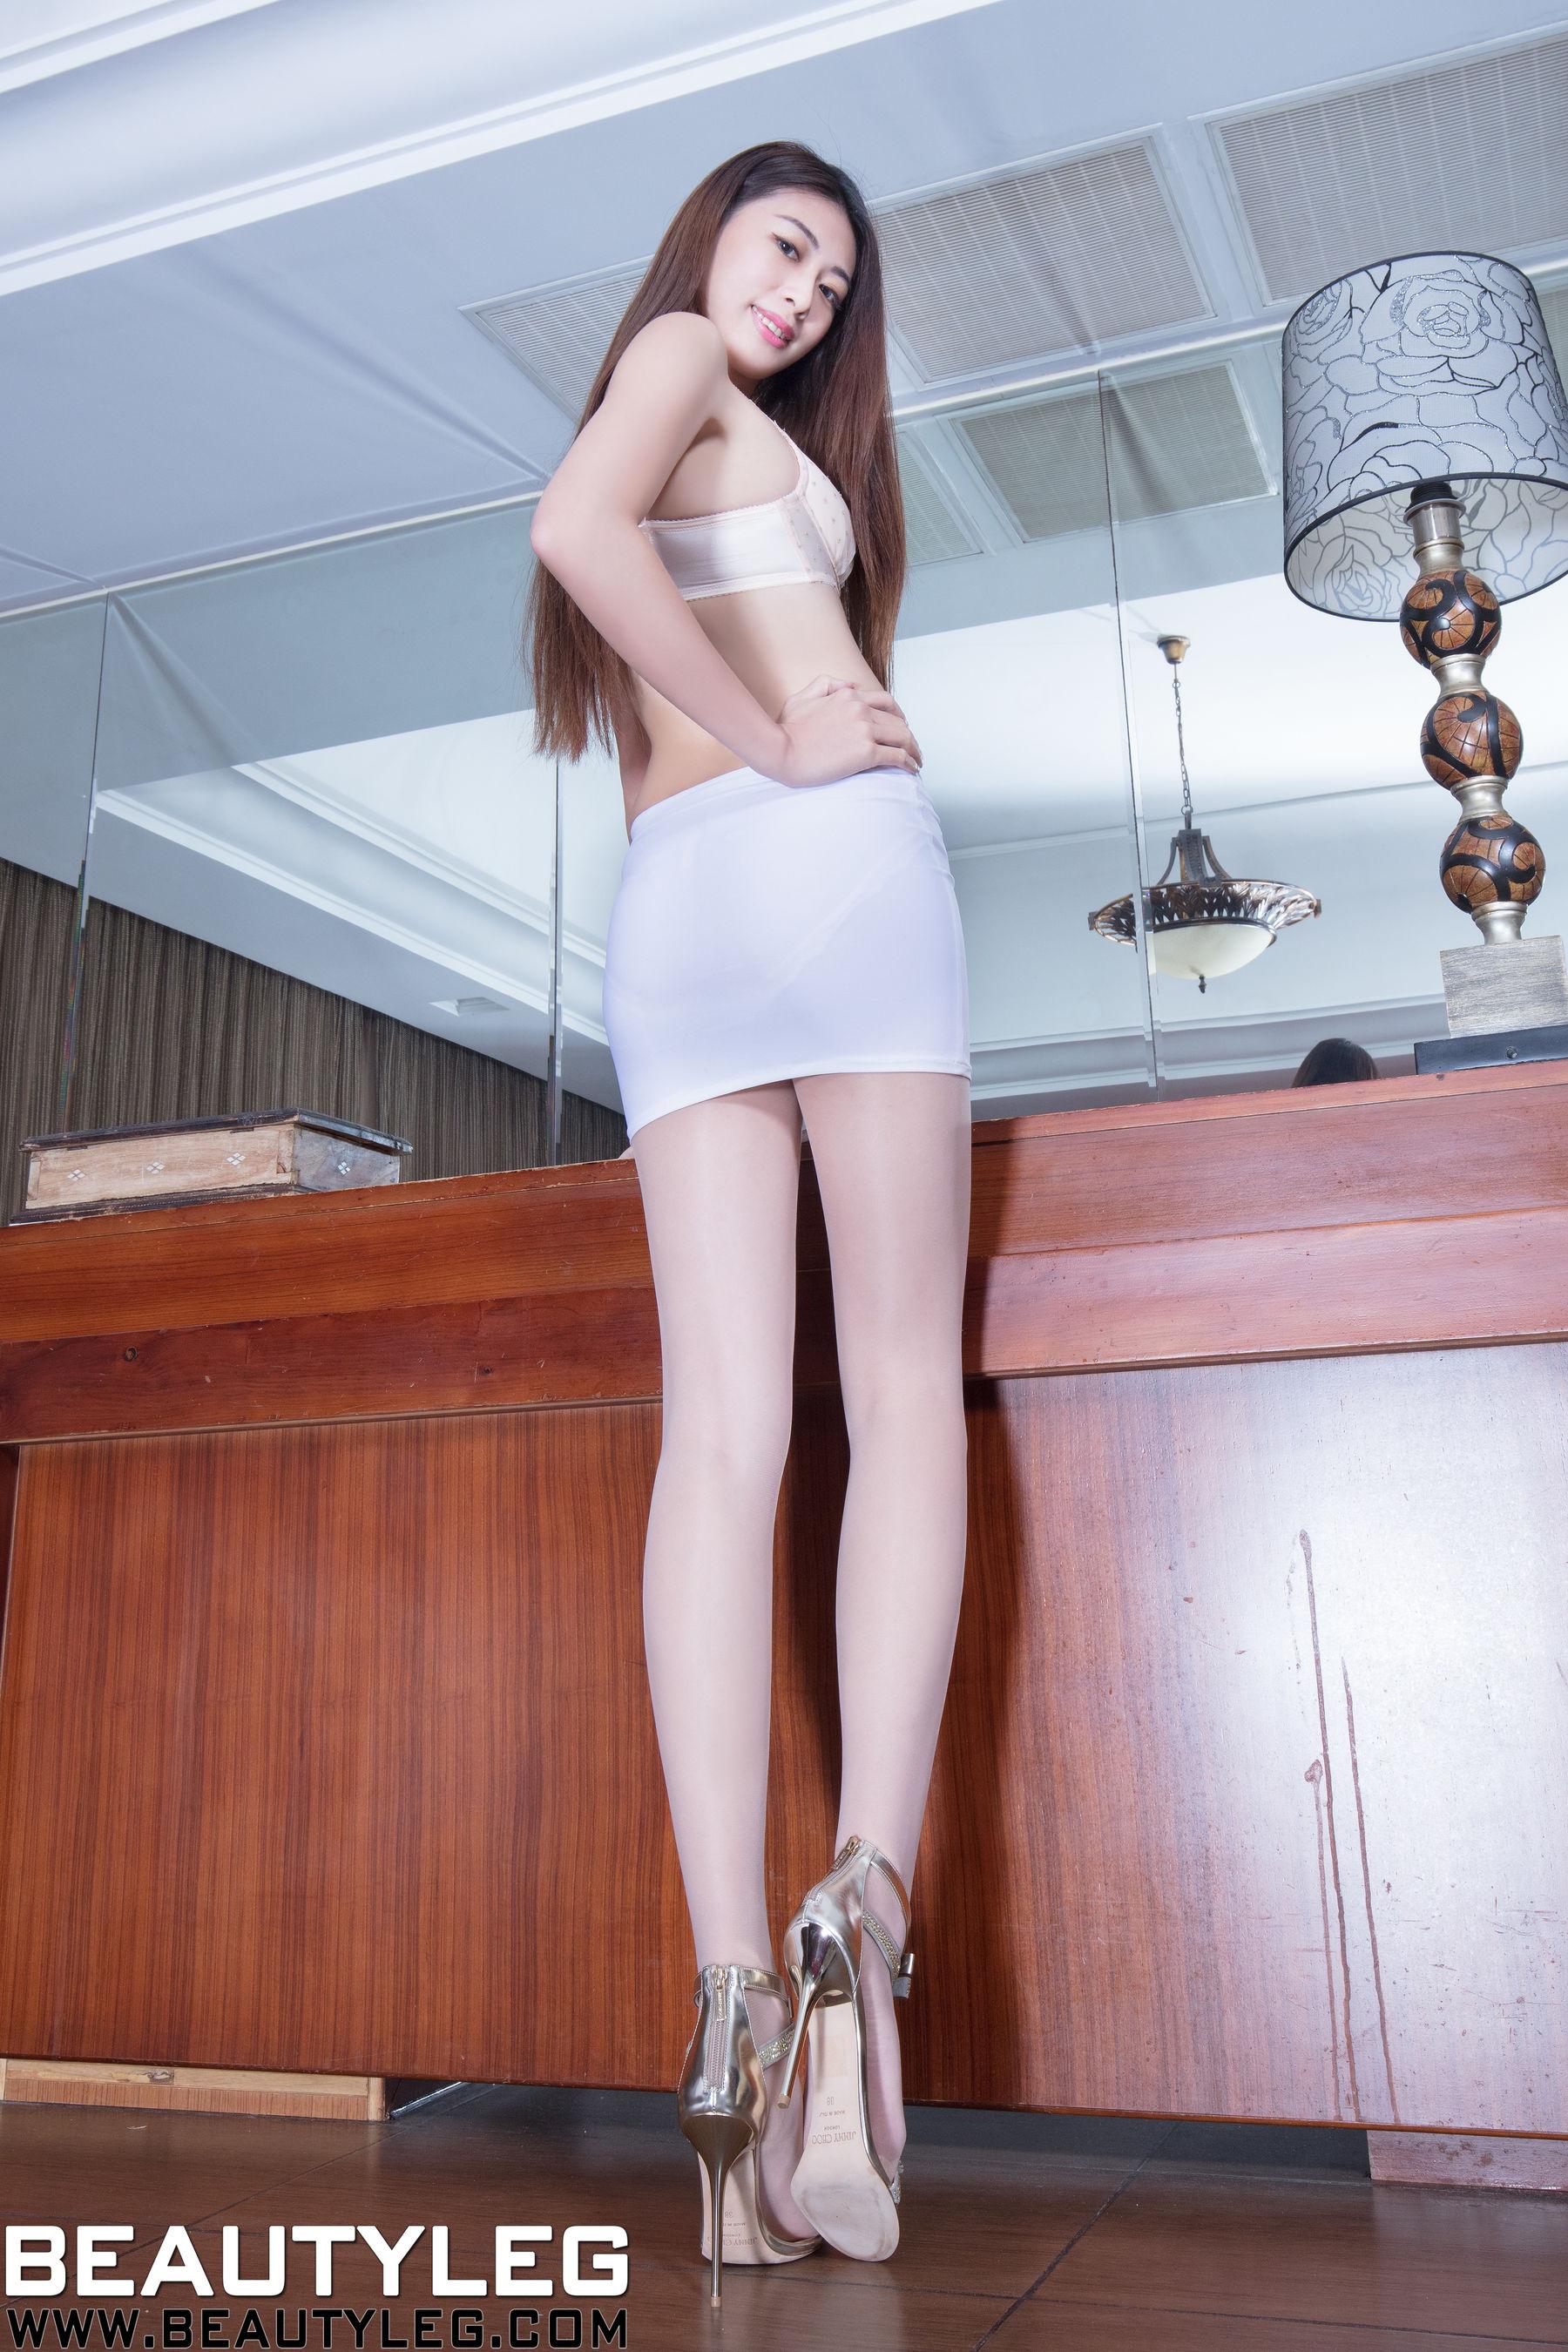 VOL.1571 [Beautyleg]丝袜美女丝袜美腿长腿美女:蔡茵茵(腿模Flora)超高清个人性感漂亮大图(47P)